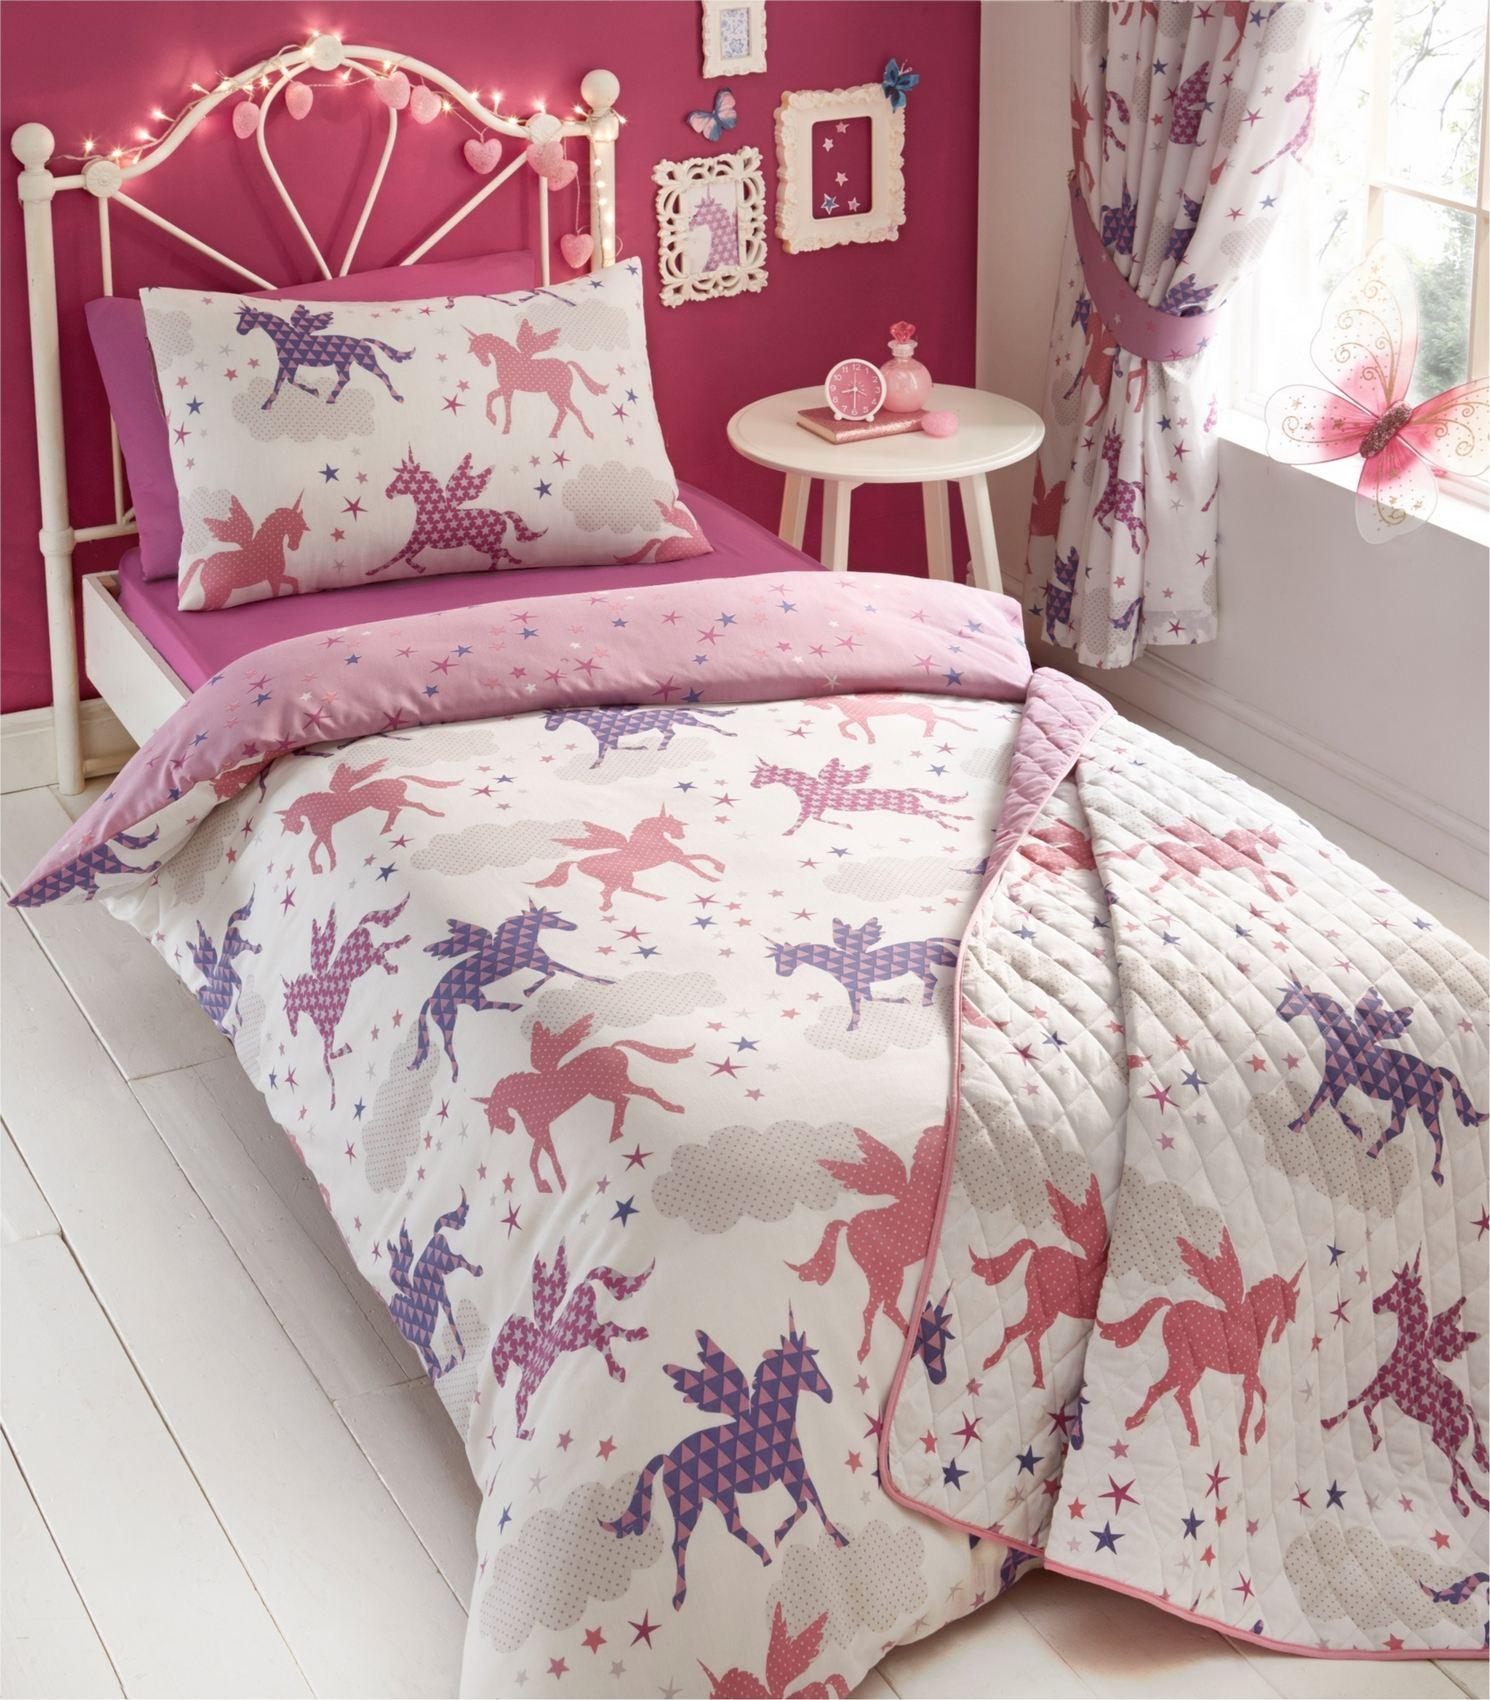 unicorns duvet cover pillowcase bedding bed set or. Black Bedroom Furniture Sets. Home Design Ideas